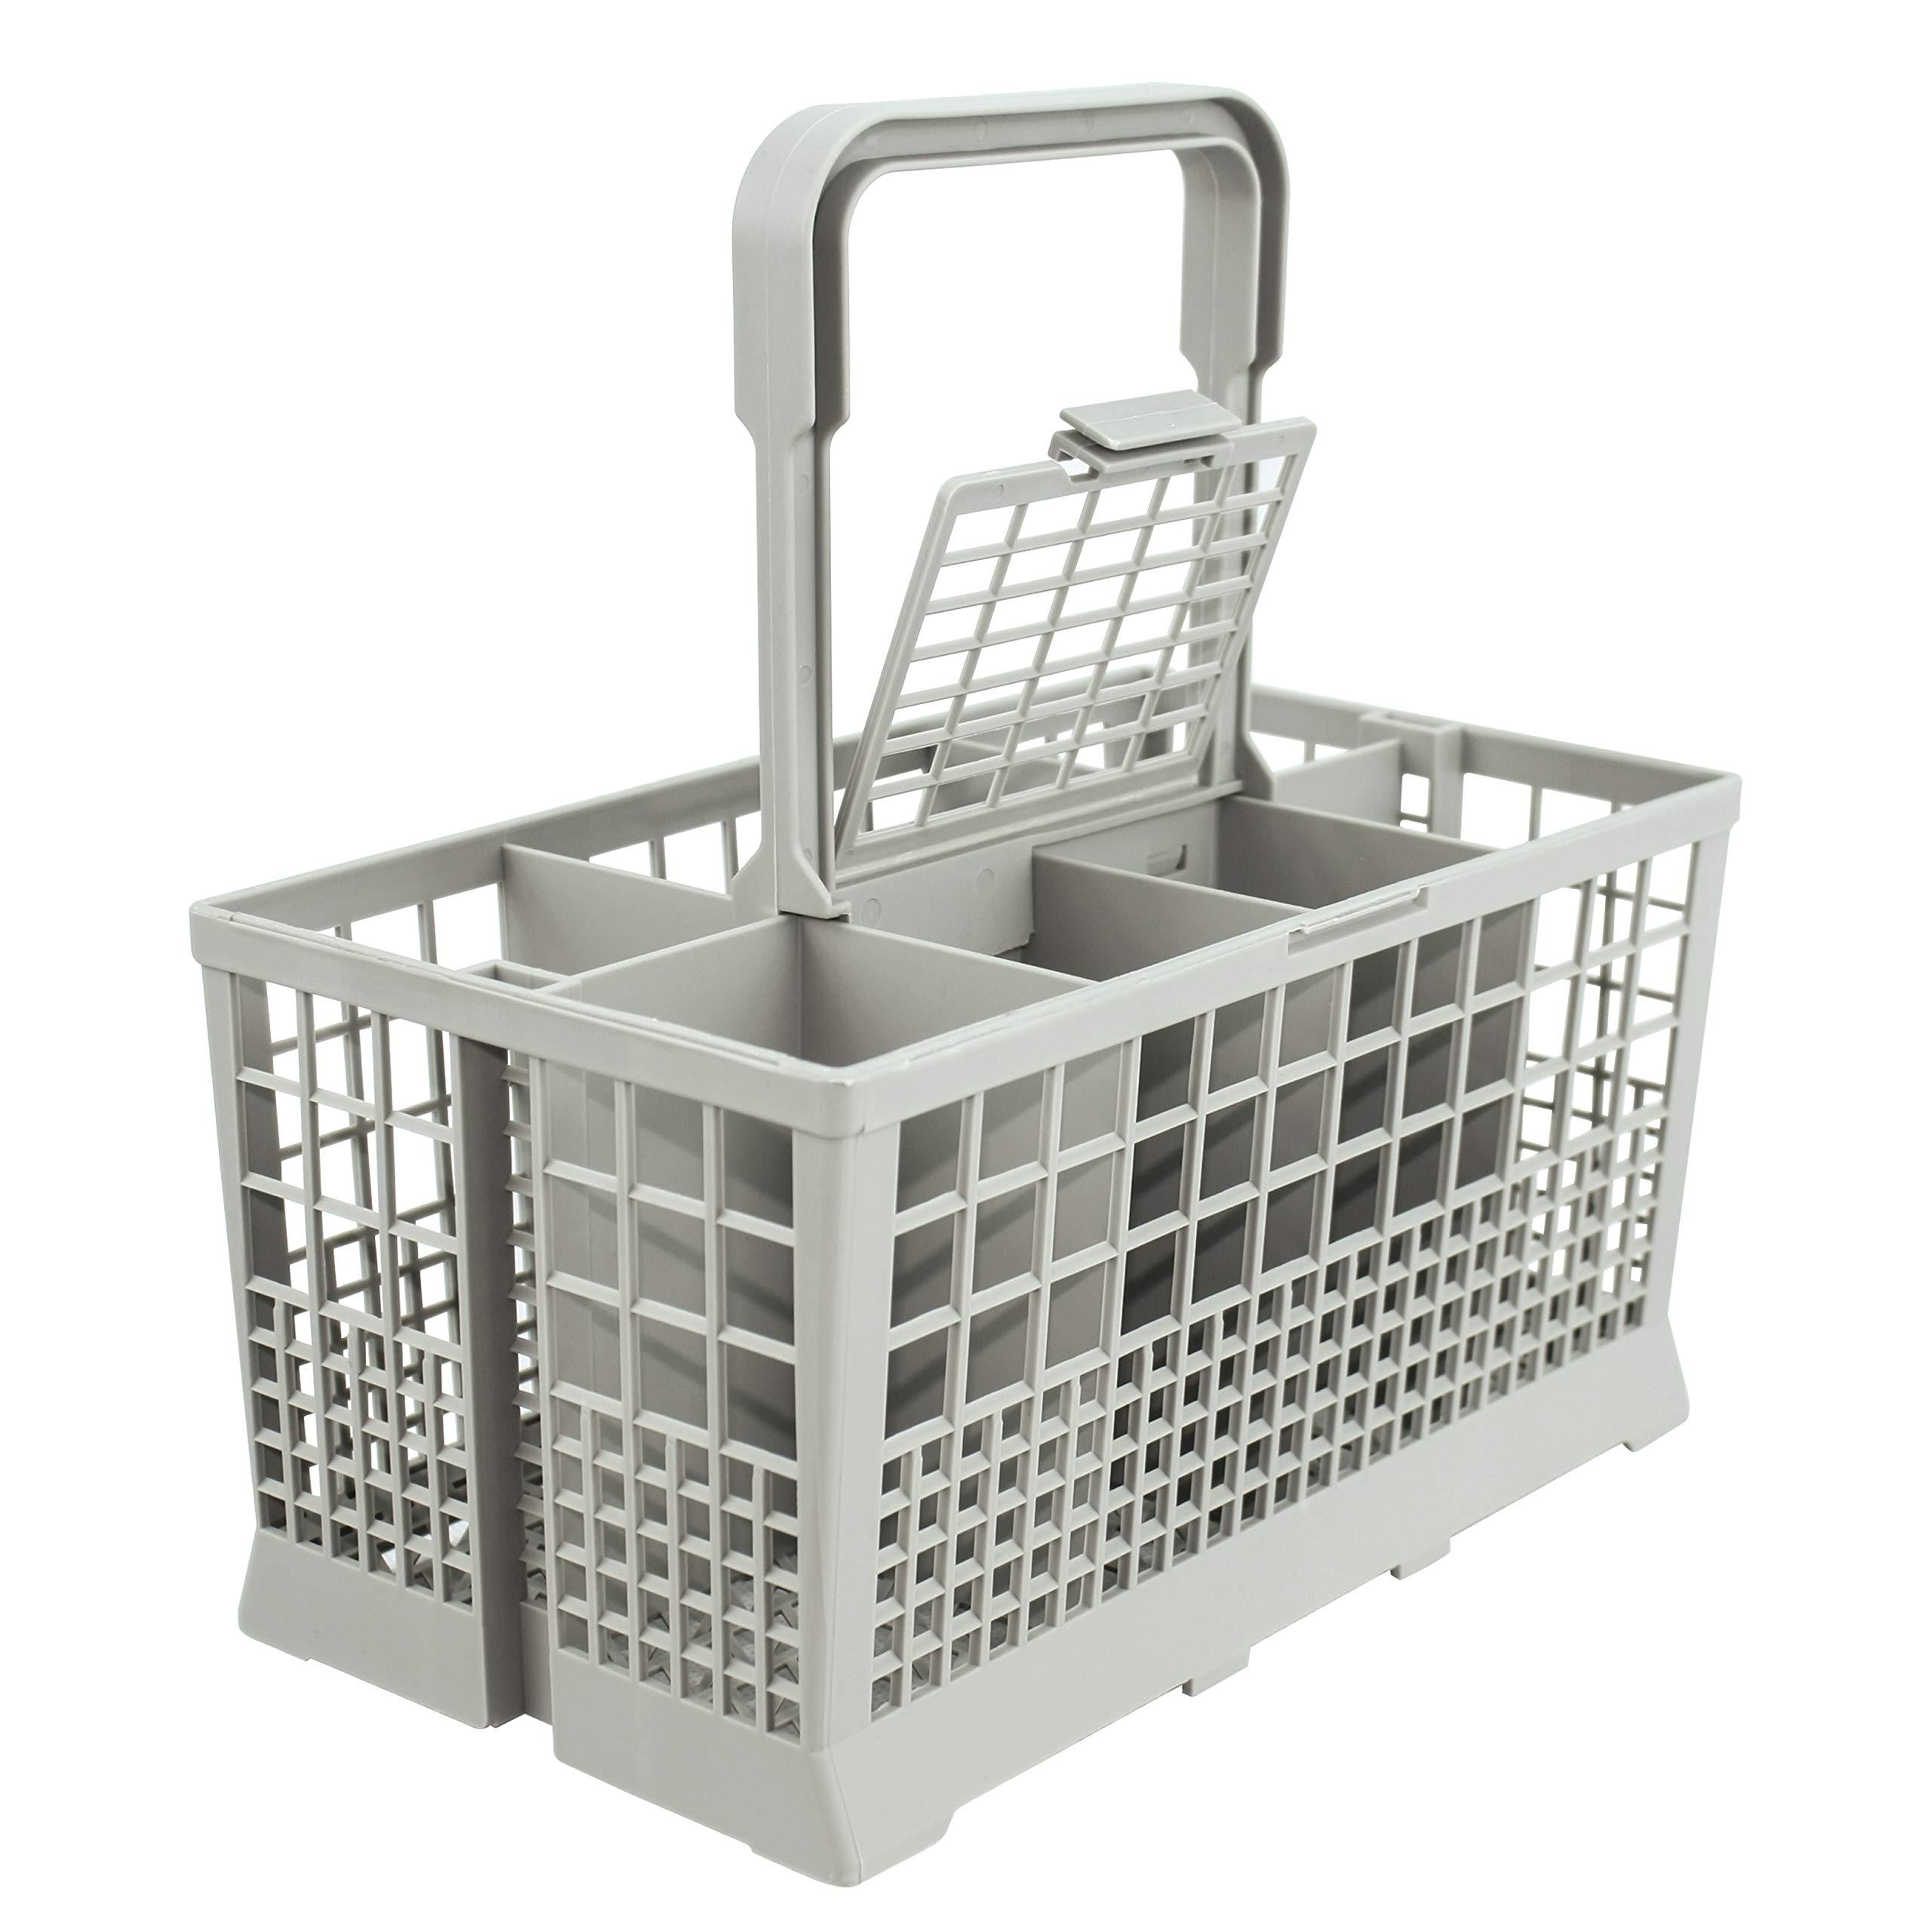 Universal Dishwasher Cutlery Basket (9.5'' x 5.4''x 4.8'') fits Kenmore, Whirlpool, Bosch, Maytag, KitchenAid, Maytag, Samsung, GE, and more